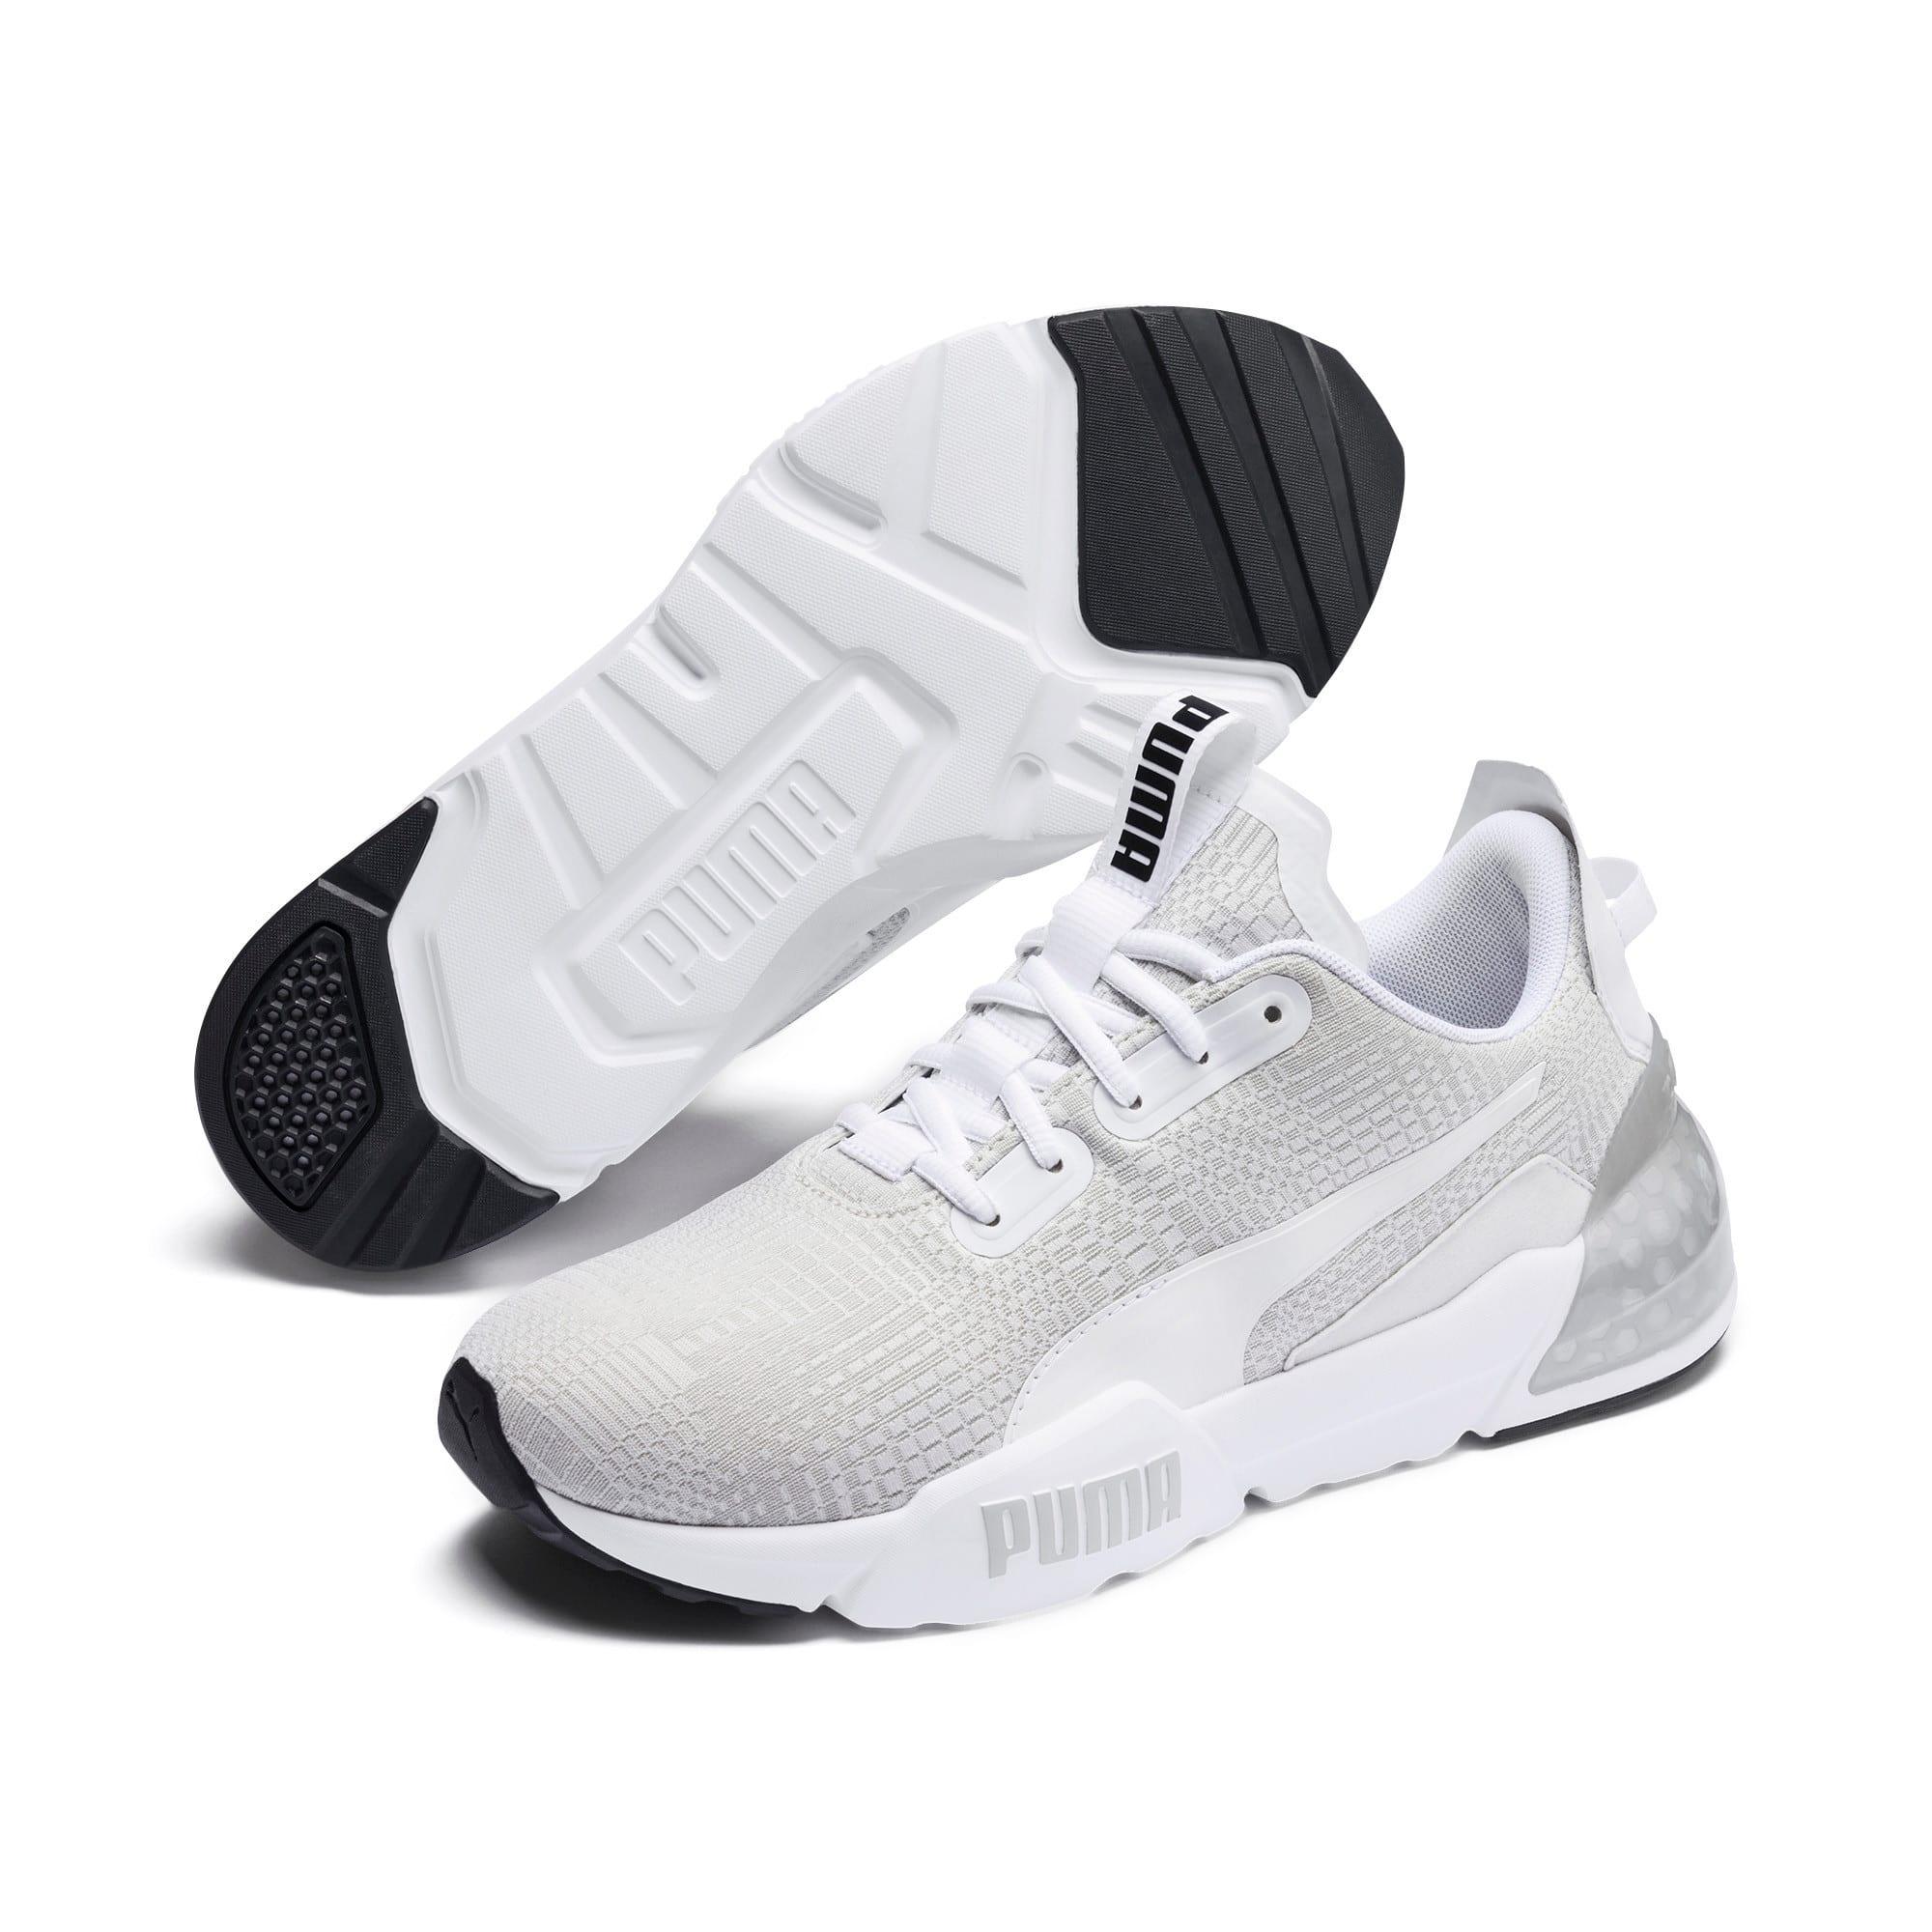 Thumbnail 3 of CELL Phase Lights Men's Running Shoes, Puma White-Gray Violet, medium